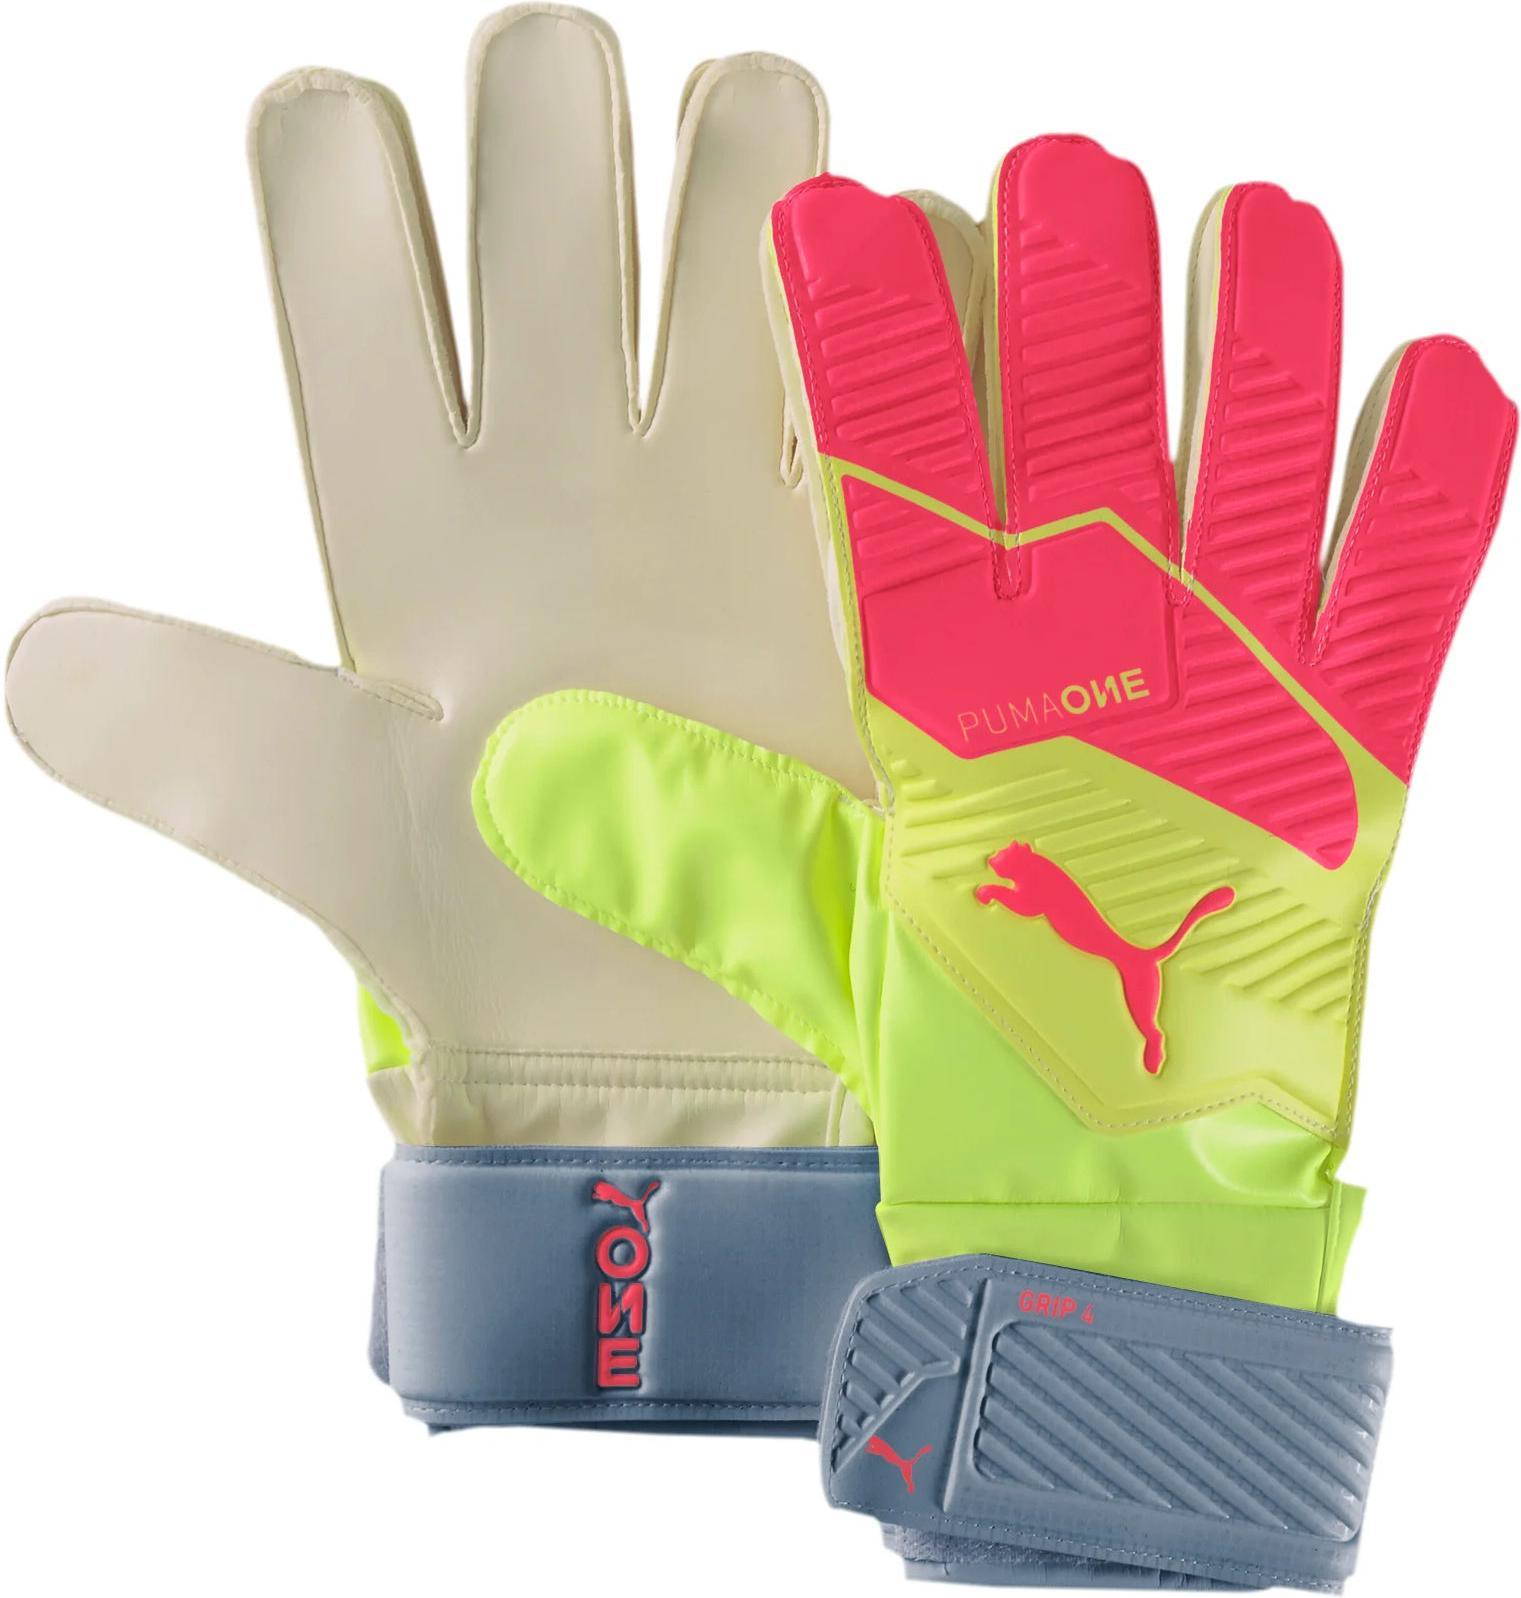 Goalkeeper's gloves Puma One Grip 4 RC